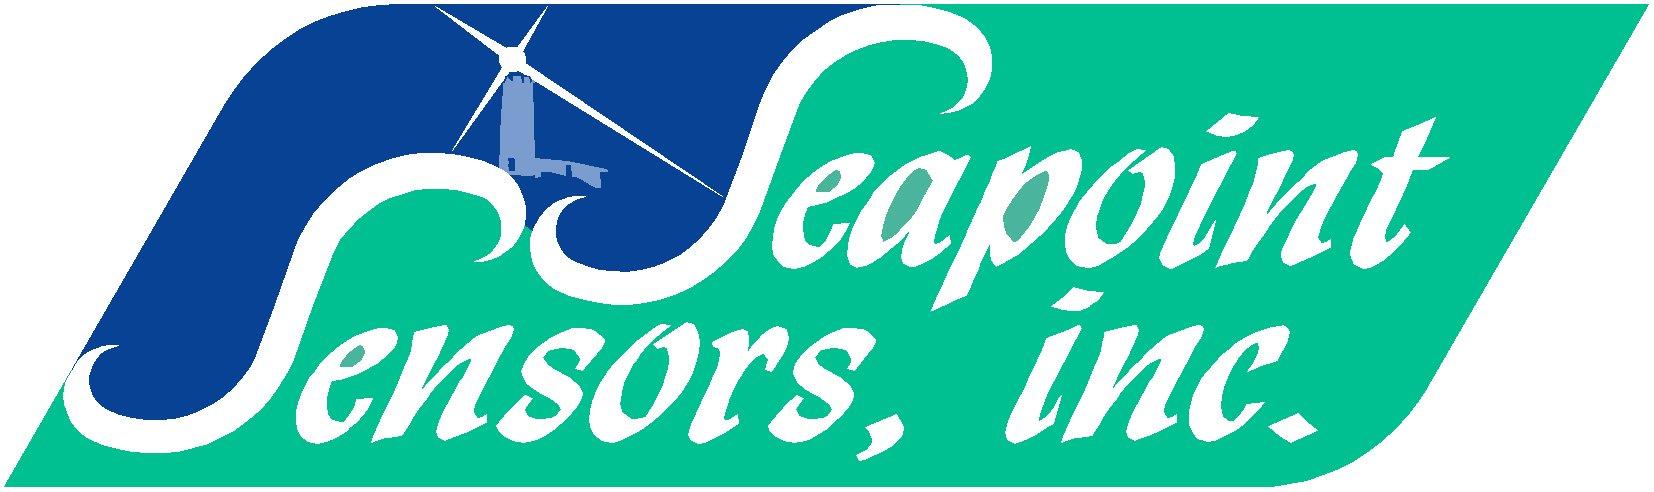 Seapoint Sensors logo